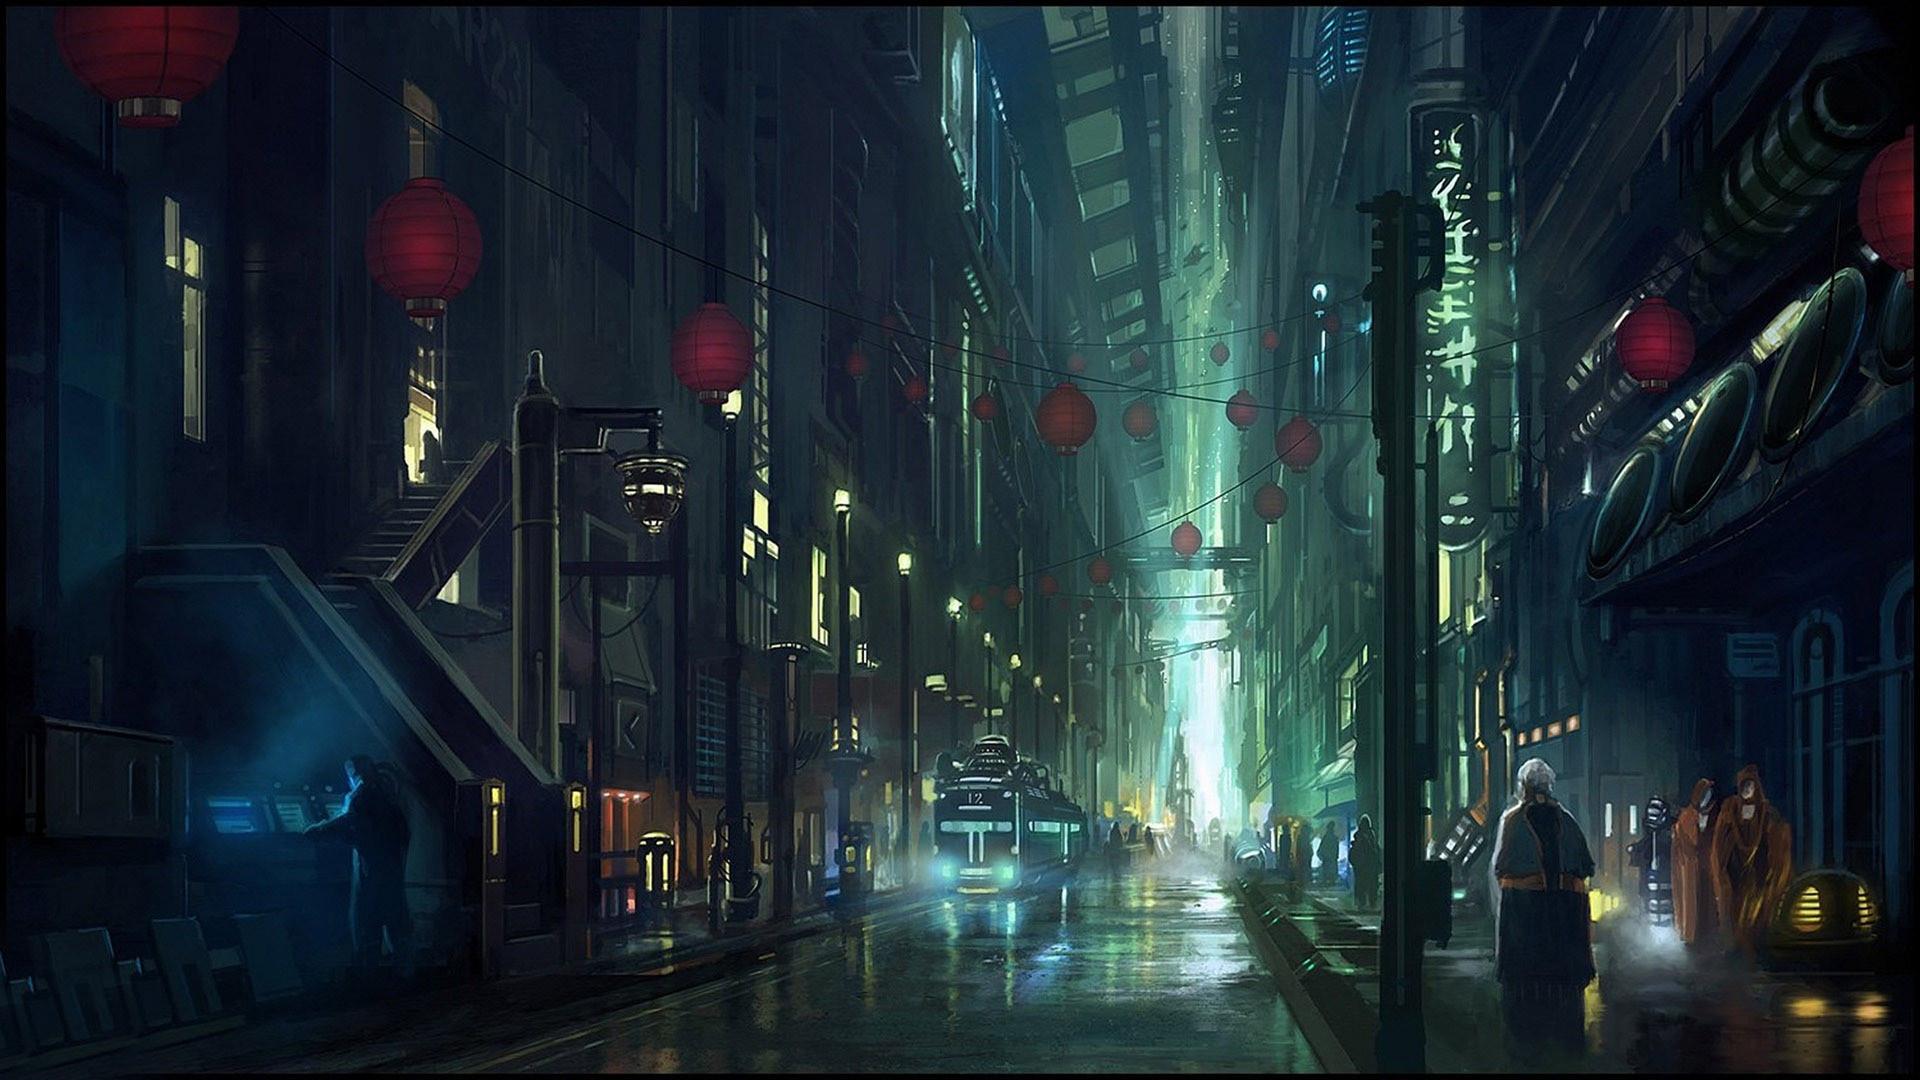 Futuristic City Wallpaper 1920x1080 75 Images